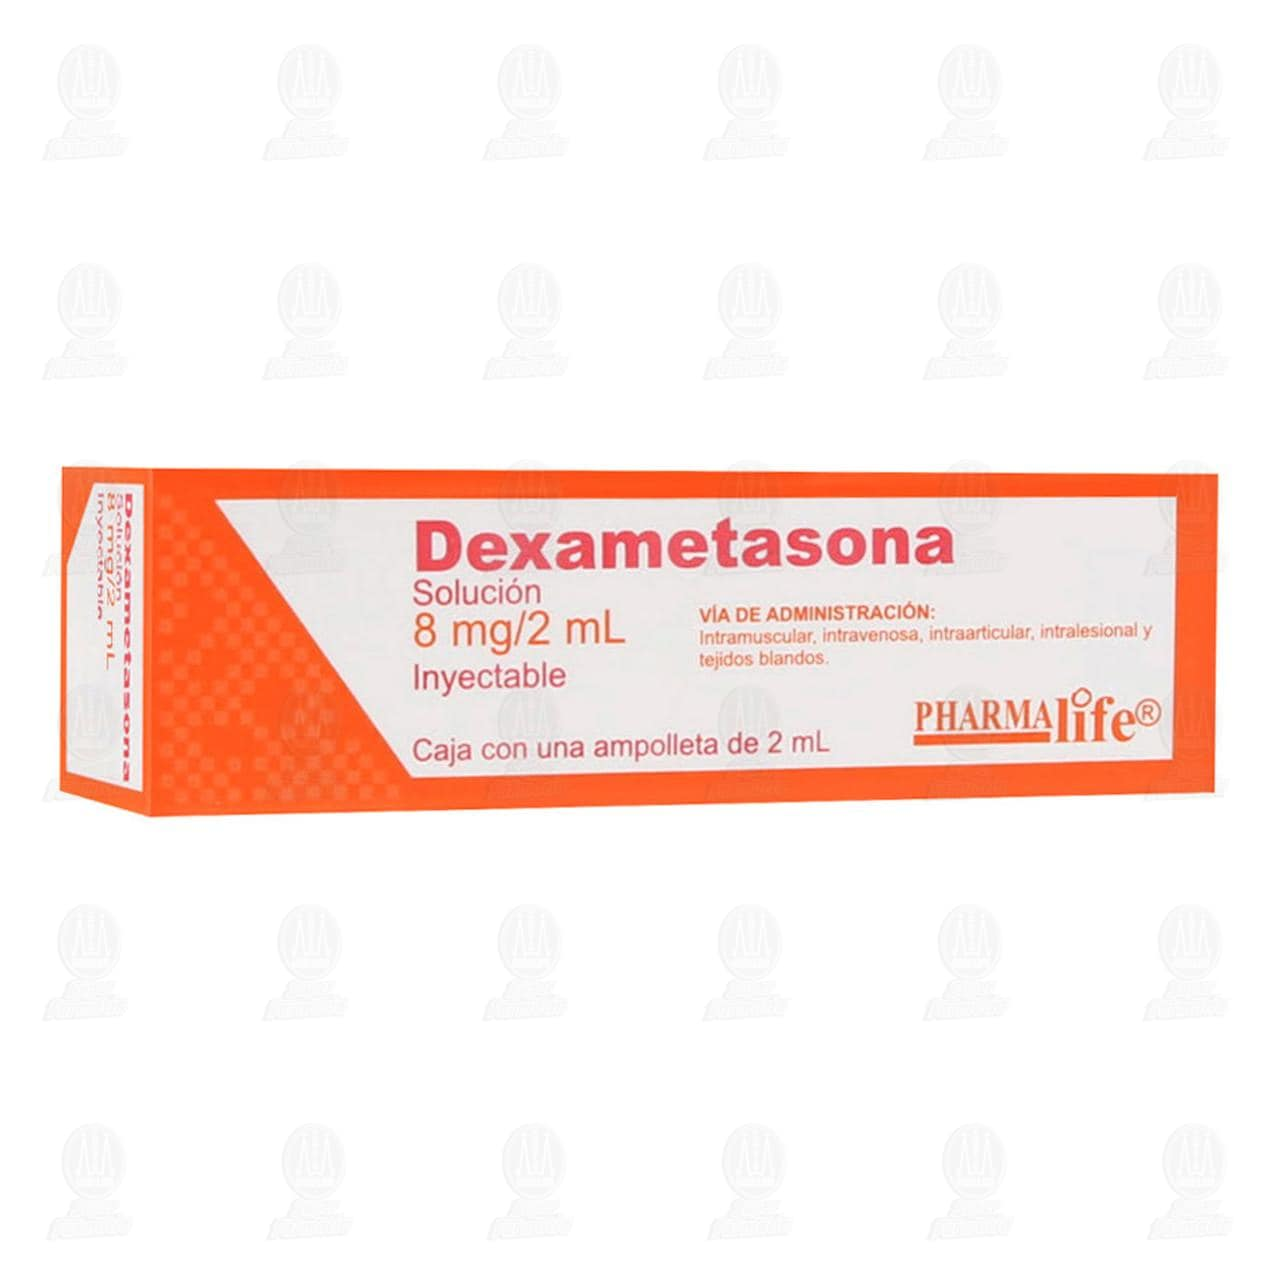 Comprar Dexametasona 8mg/2ml 1 Ampolleta Pharmalife en Farmacias Guadalajara